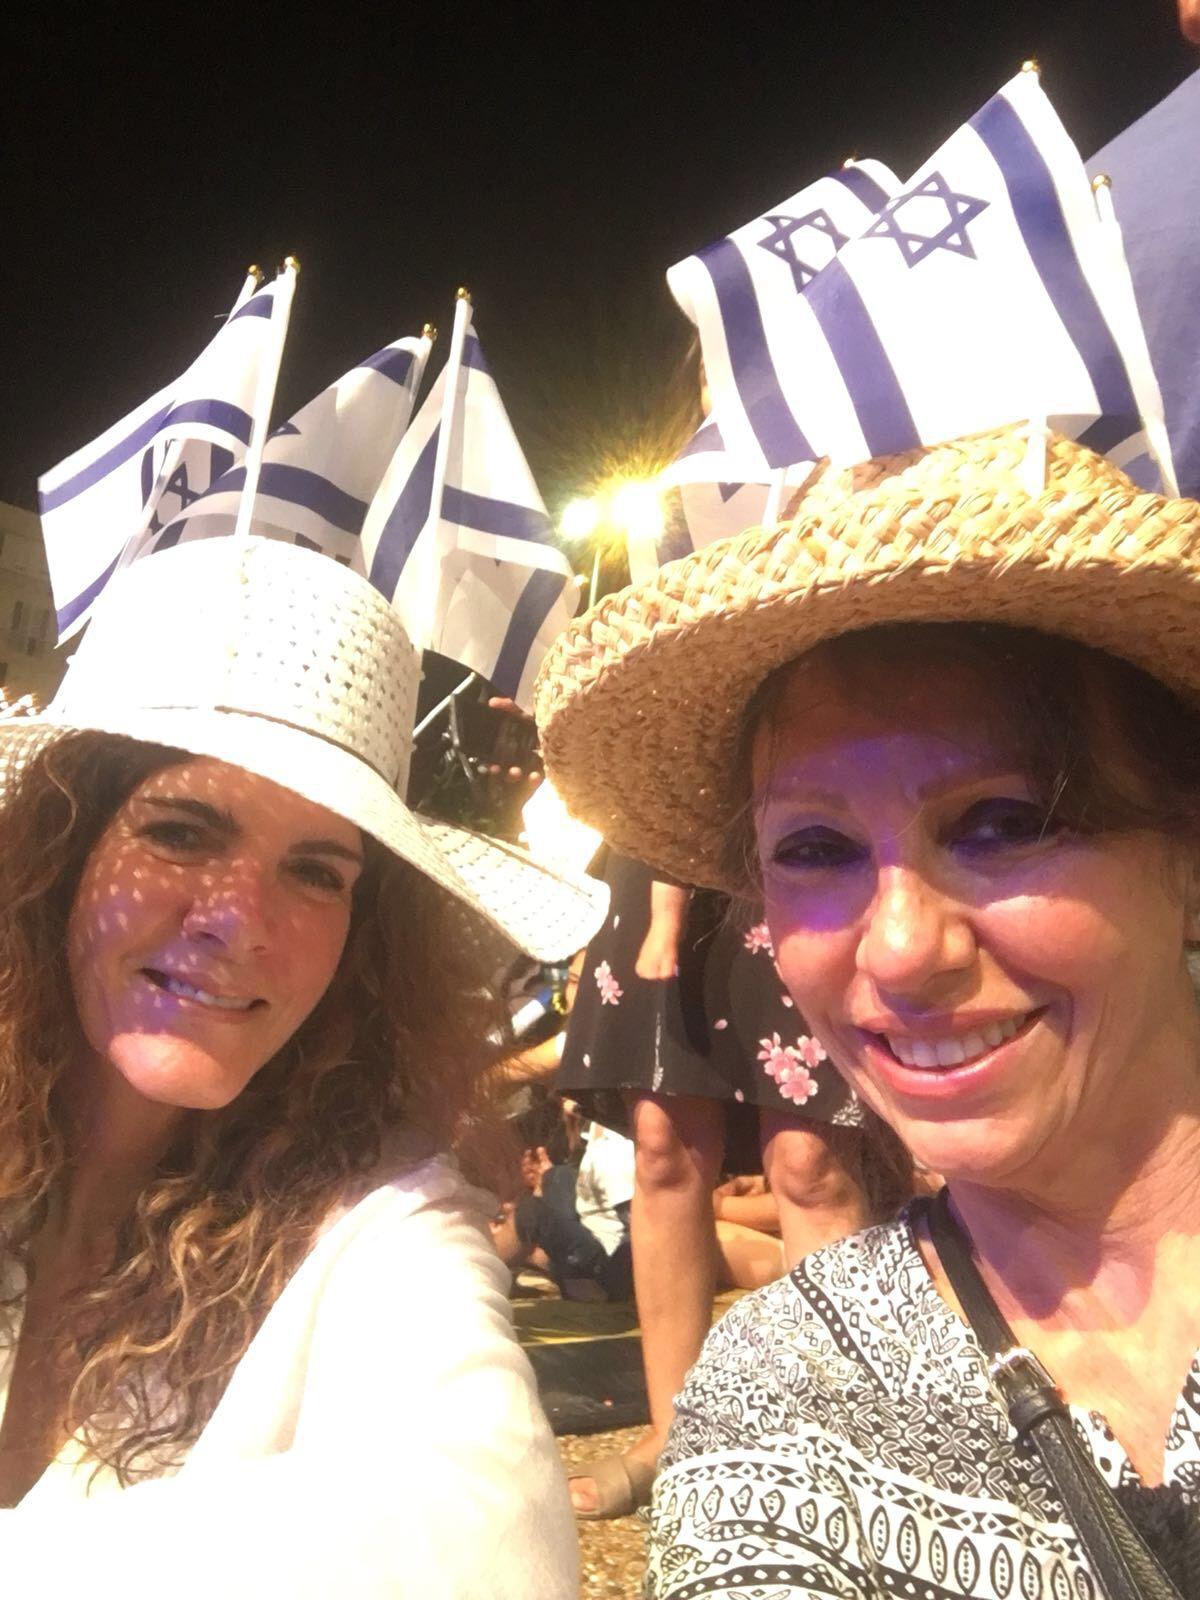 Happy birthday, Israel